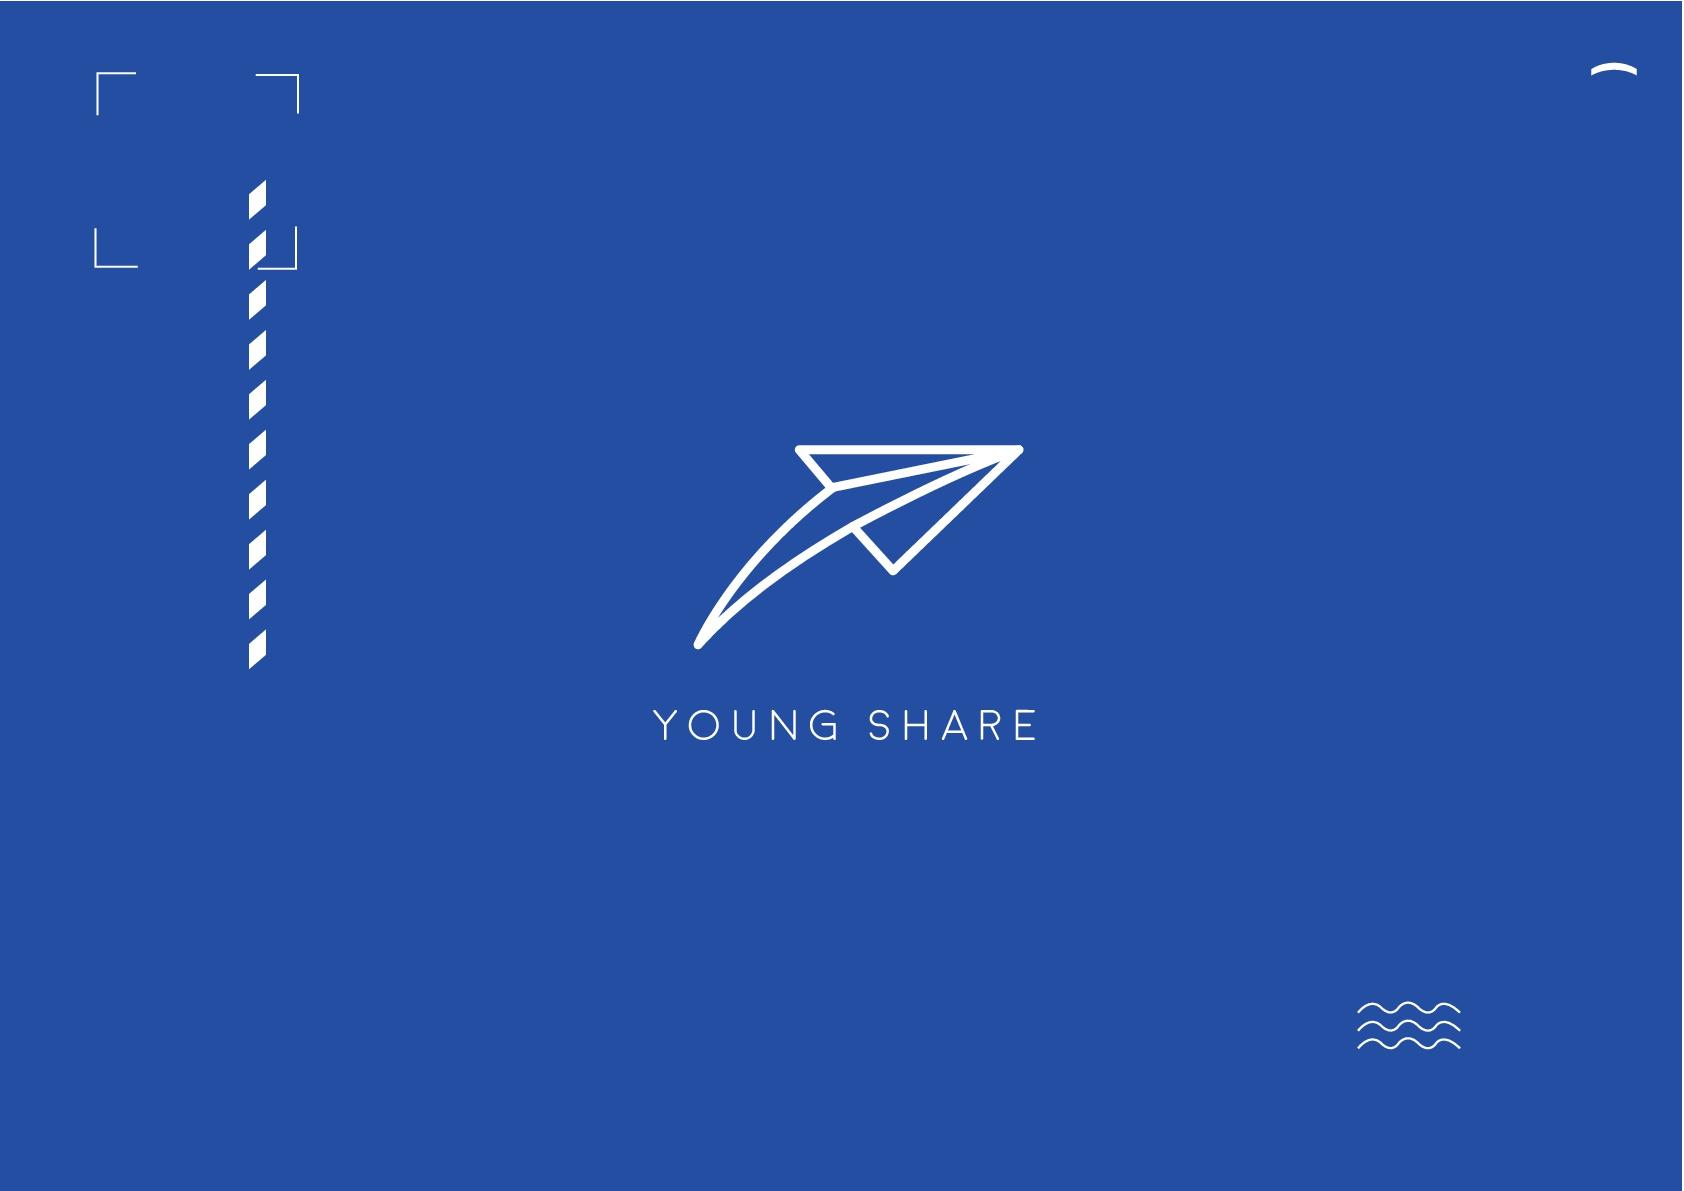 Young Share โดย คณะศิลปกรรมศาสตร์ มหาวิทยาลัยศรีนครินทรวิโรฒ